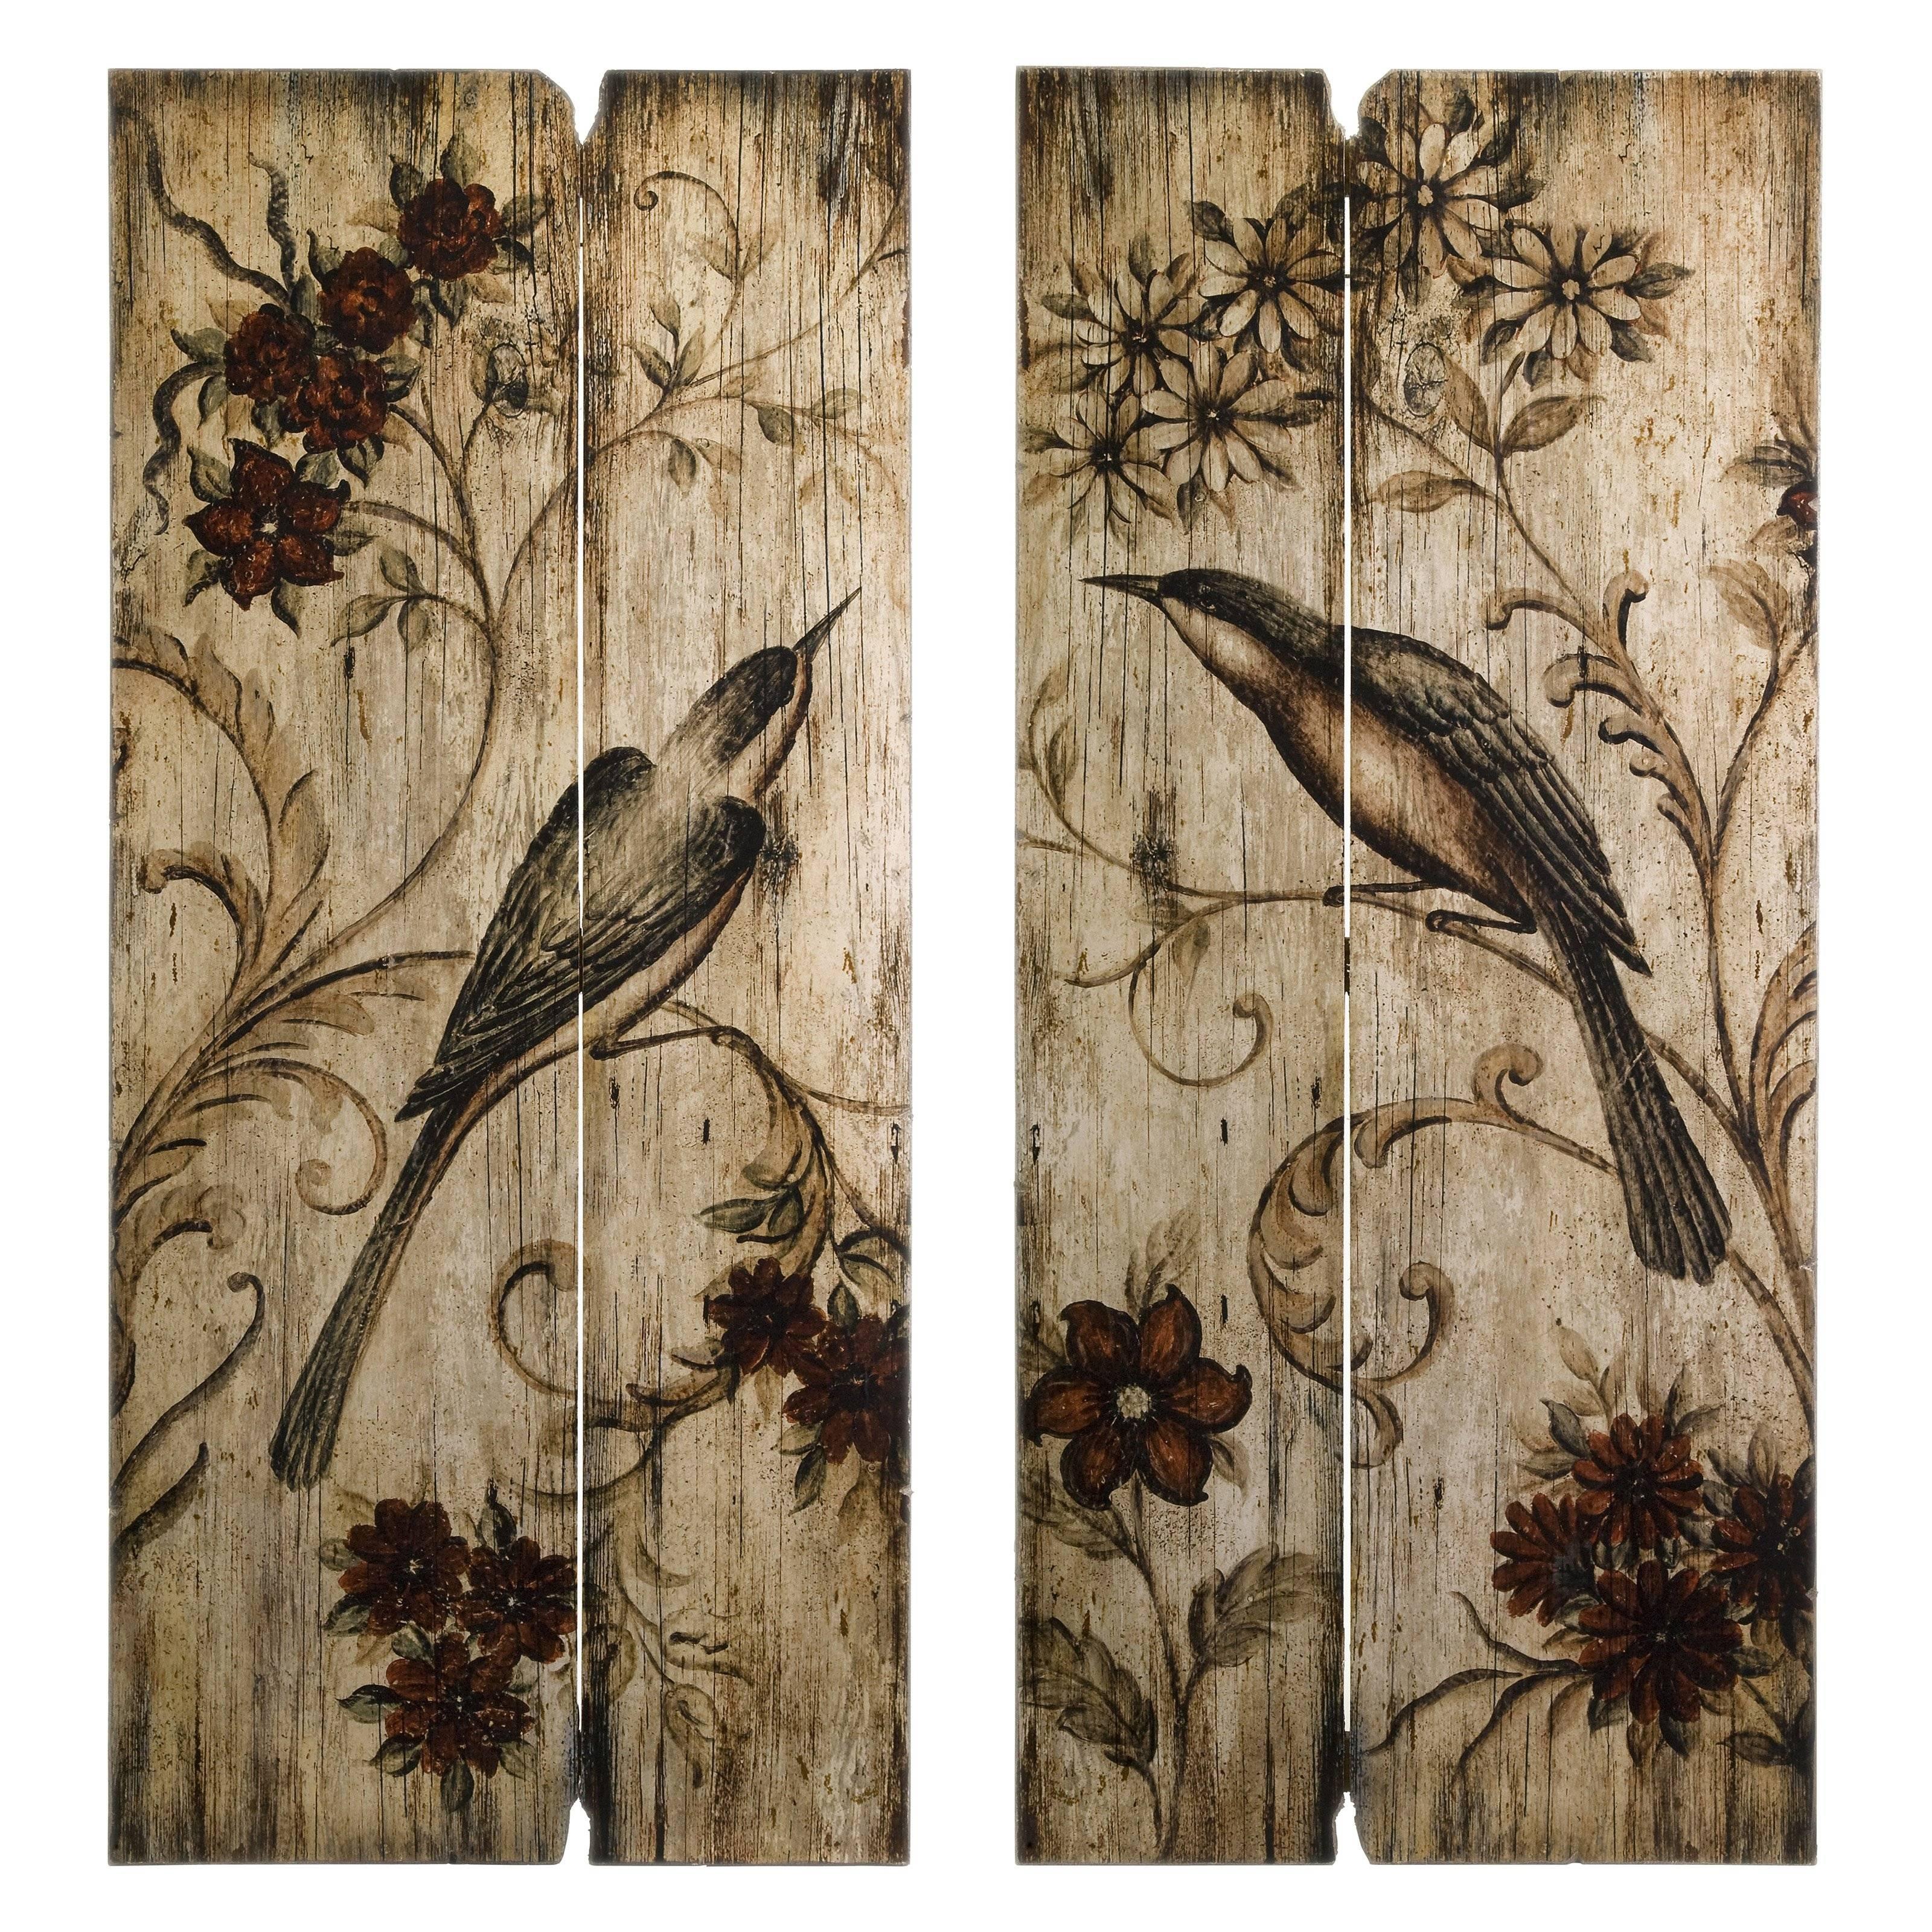 Imax Norida Bird Wood Wall Art – Set Of 2 | Hayneedle Throughout Most Recent Wood Wall Art Panels (Gallery 6 of 20)